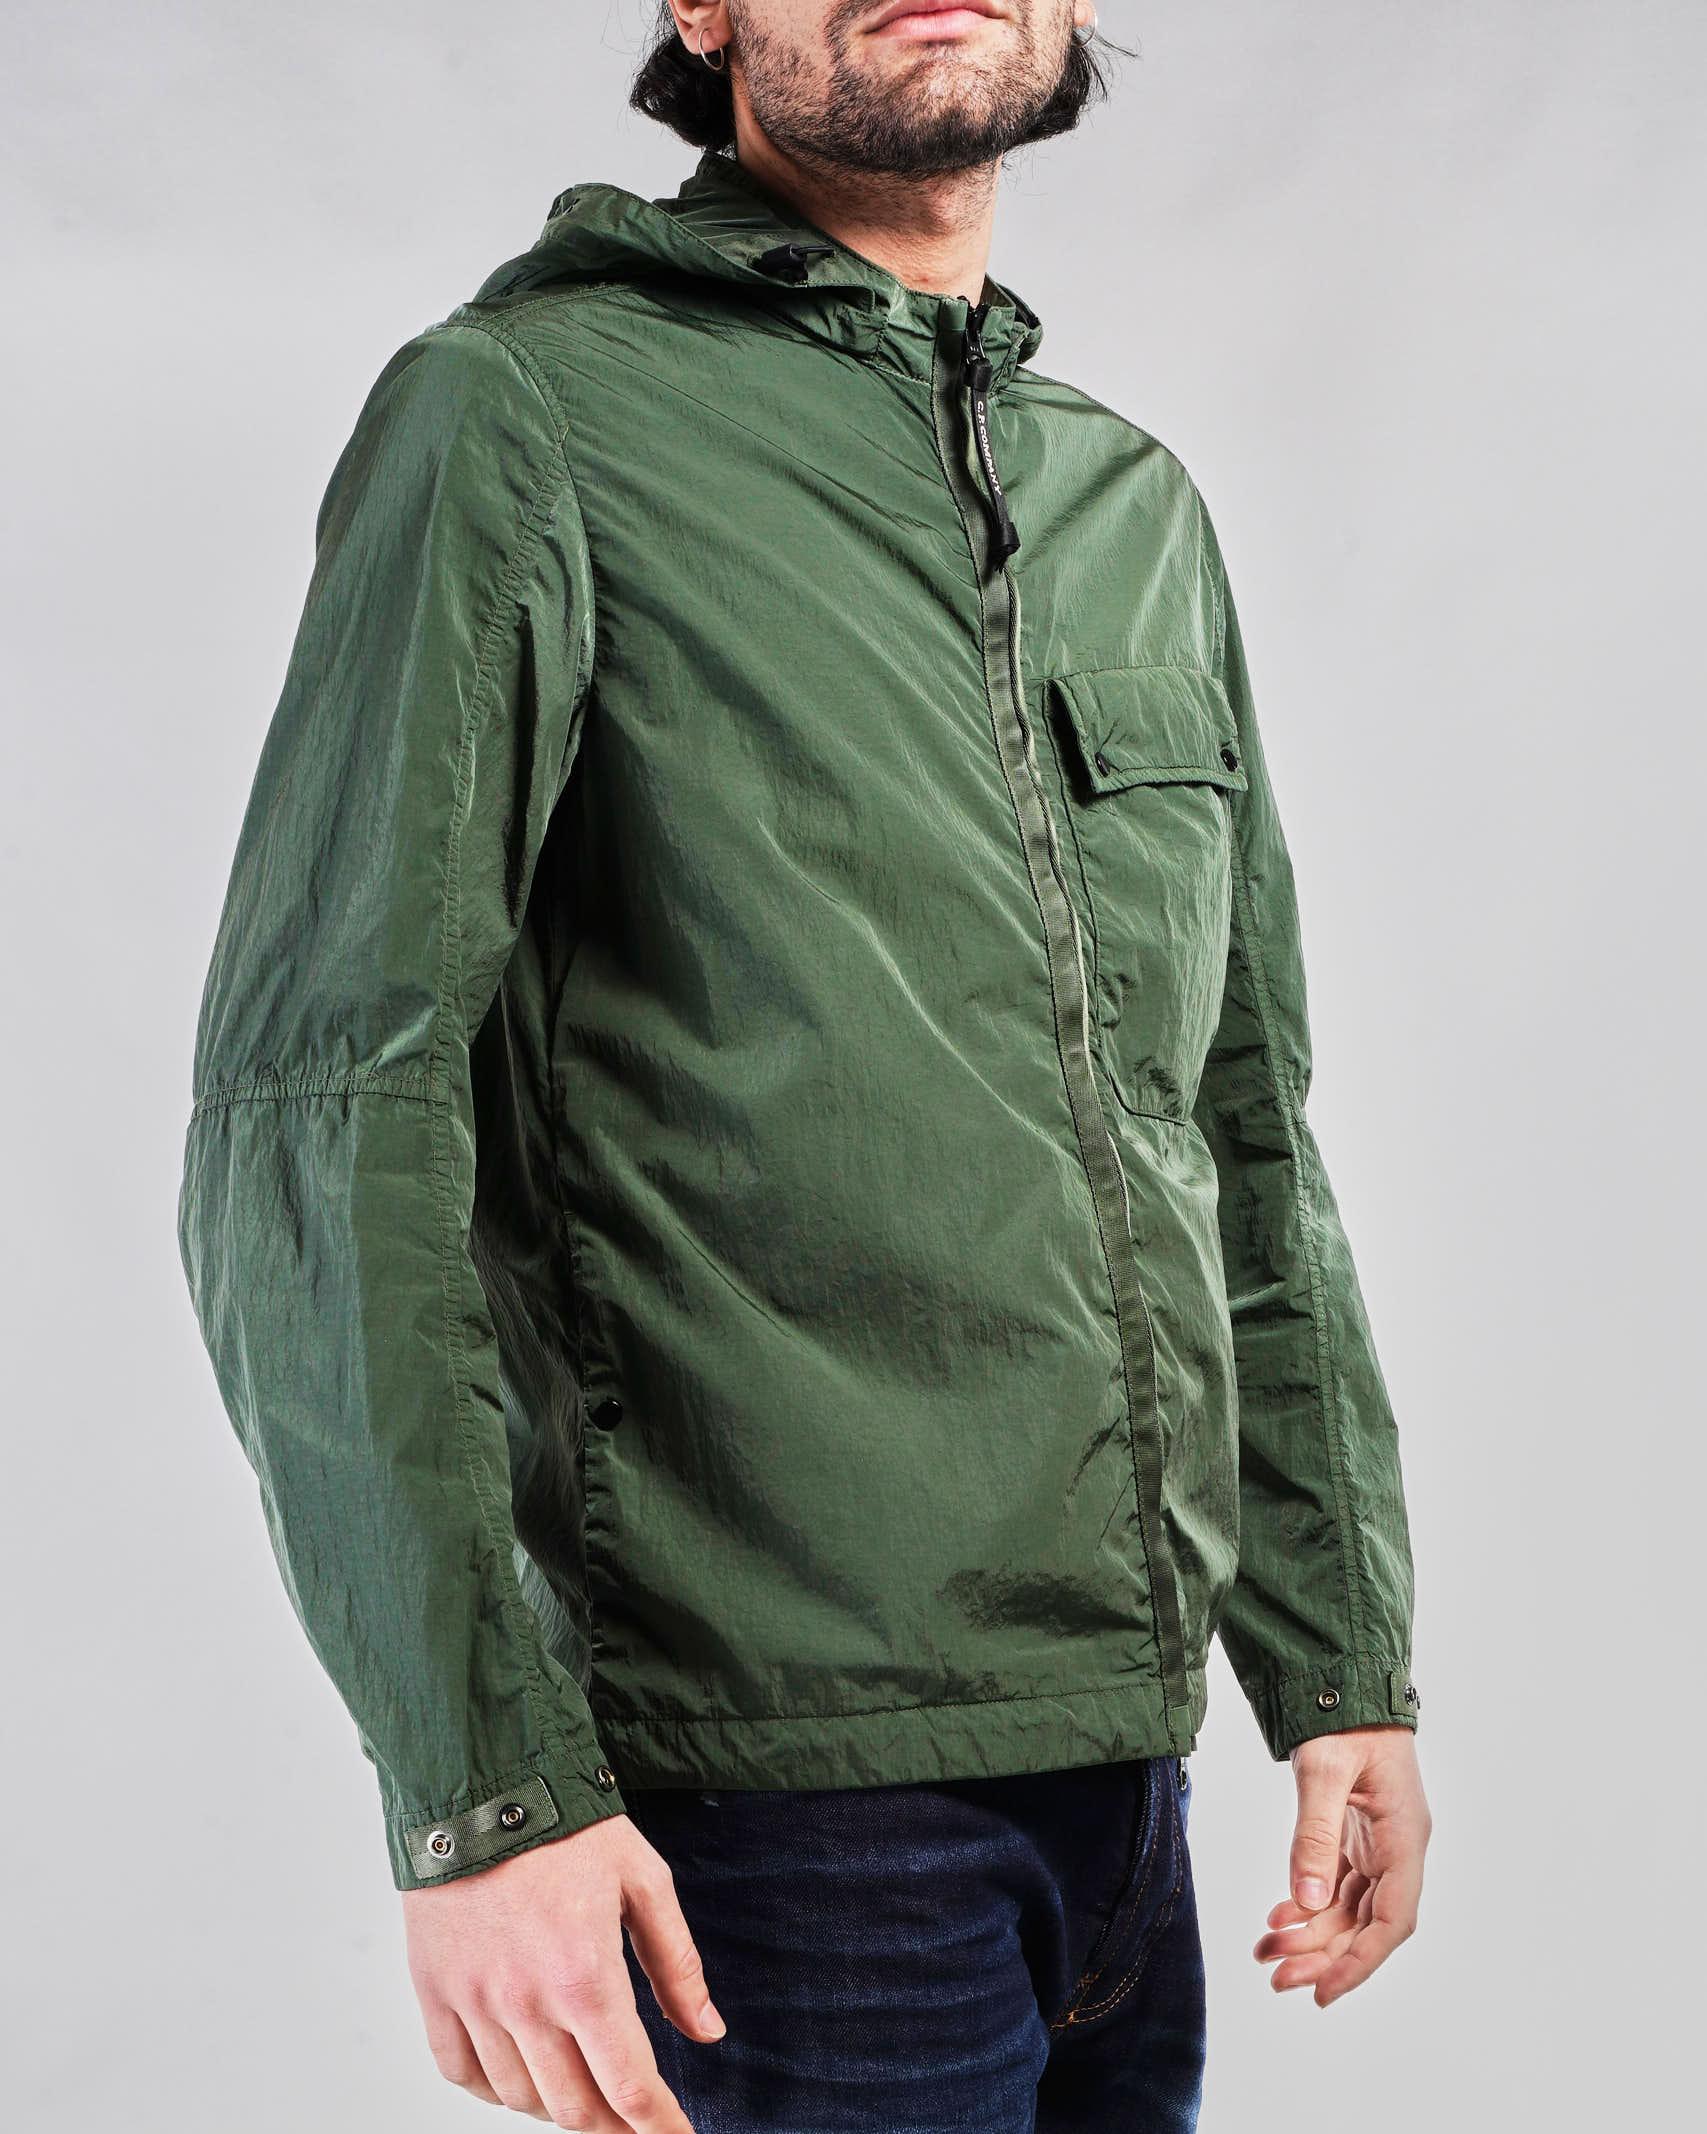 Giubbotto Chrome-R Mixed Garment Dyed Goggle Overshirt C.P. Company C.P. COMPANY | Giubbotto | 10CMOS026A005904M668